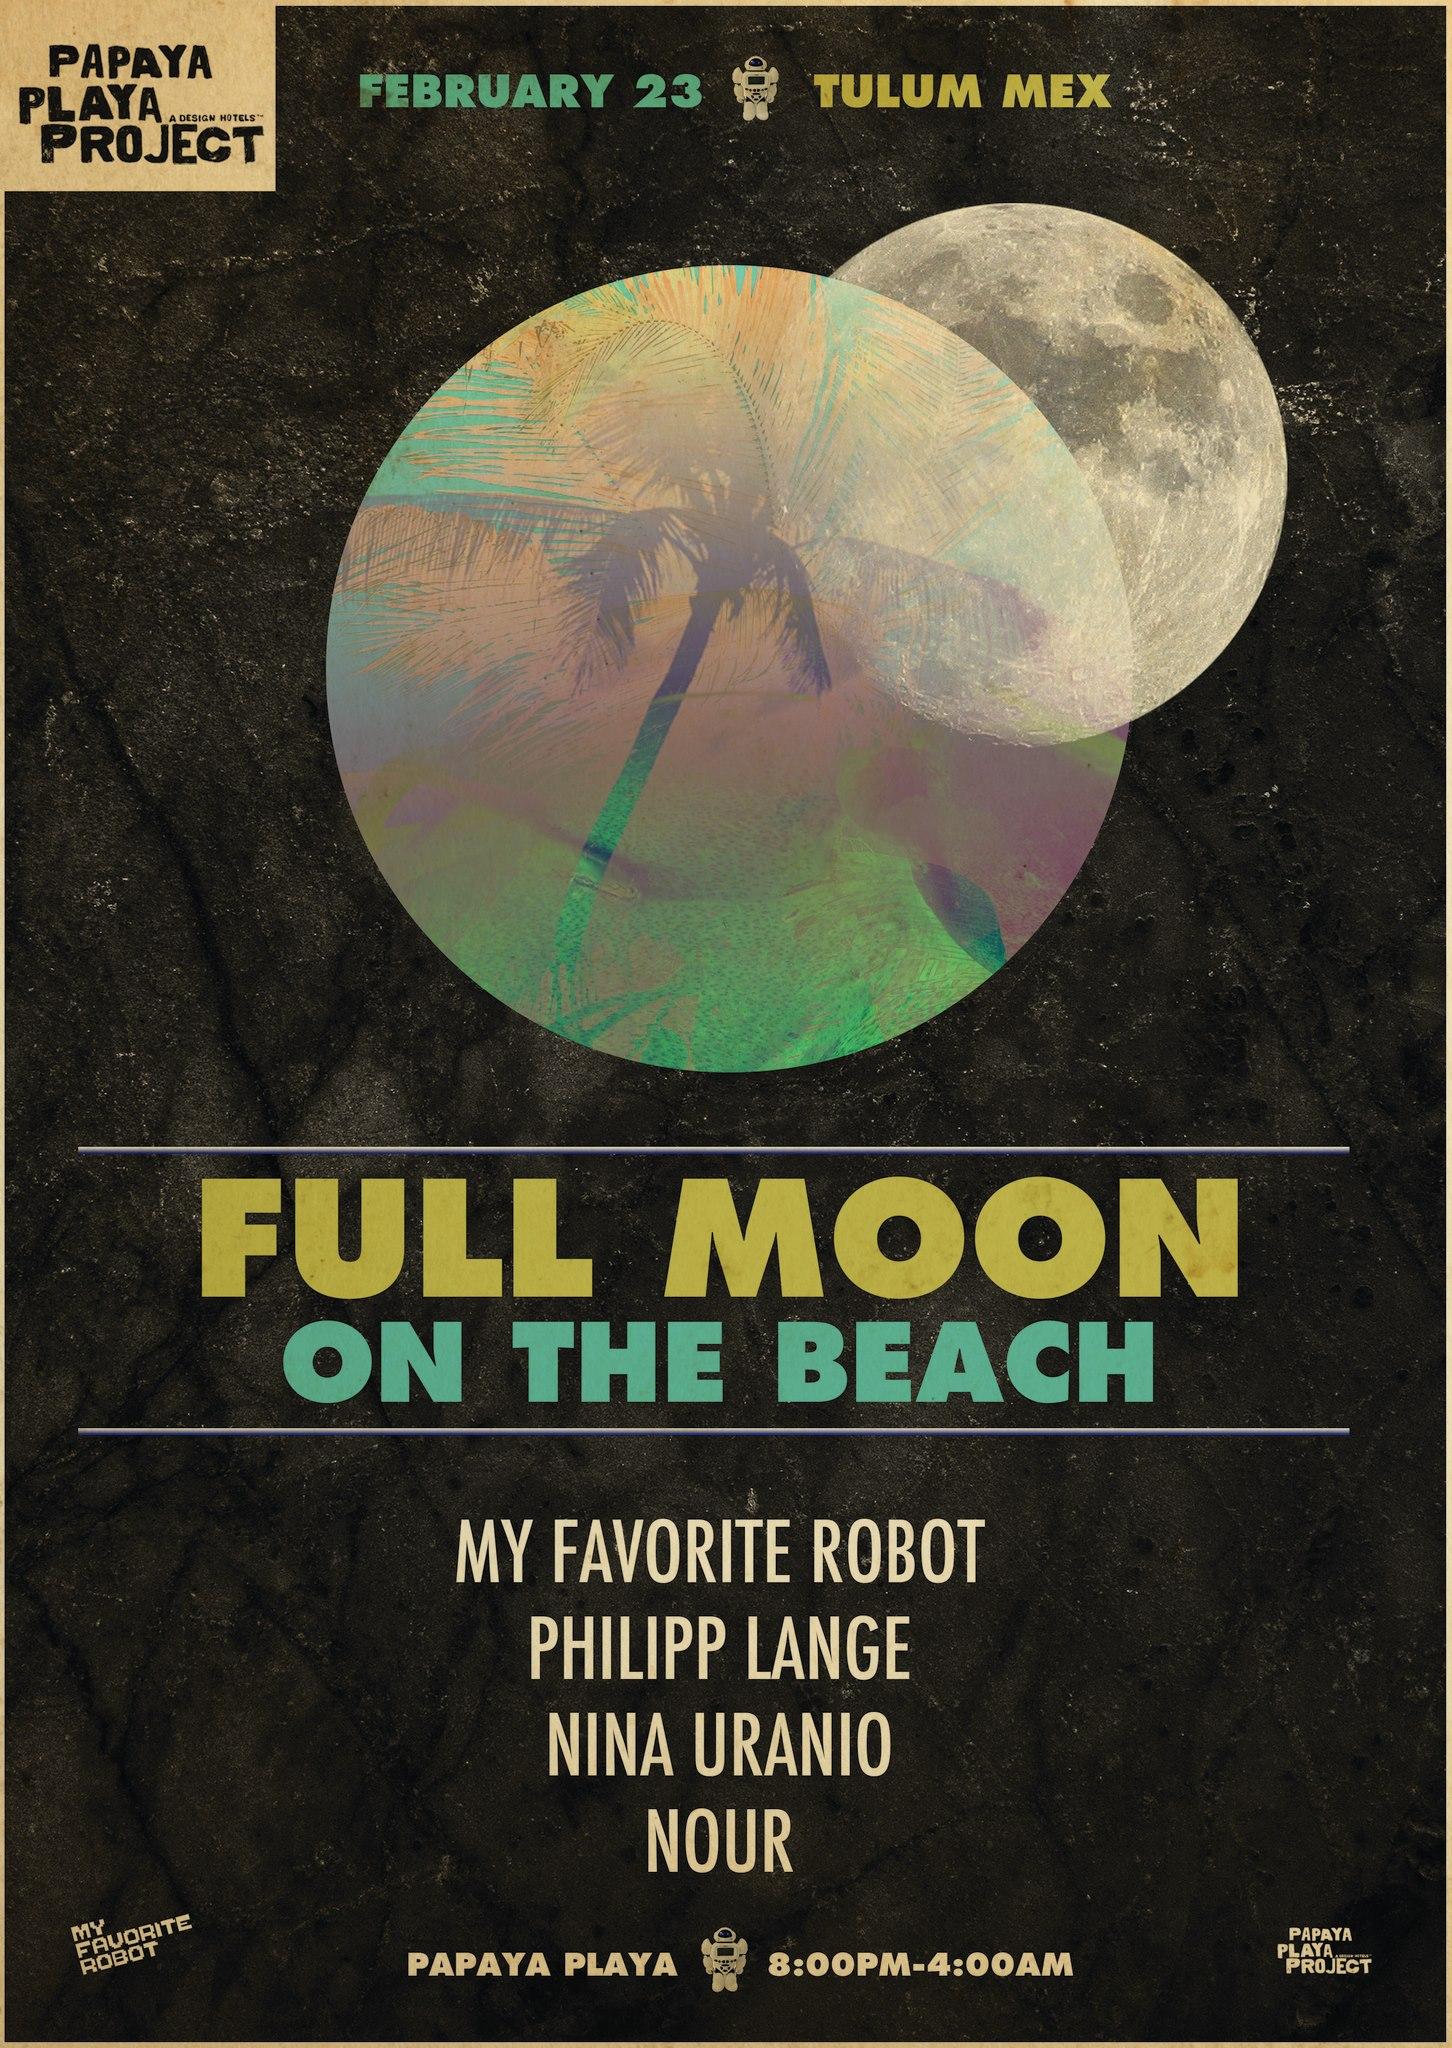 Full Moon Beach Party @ Papaya Playa Project